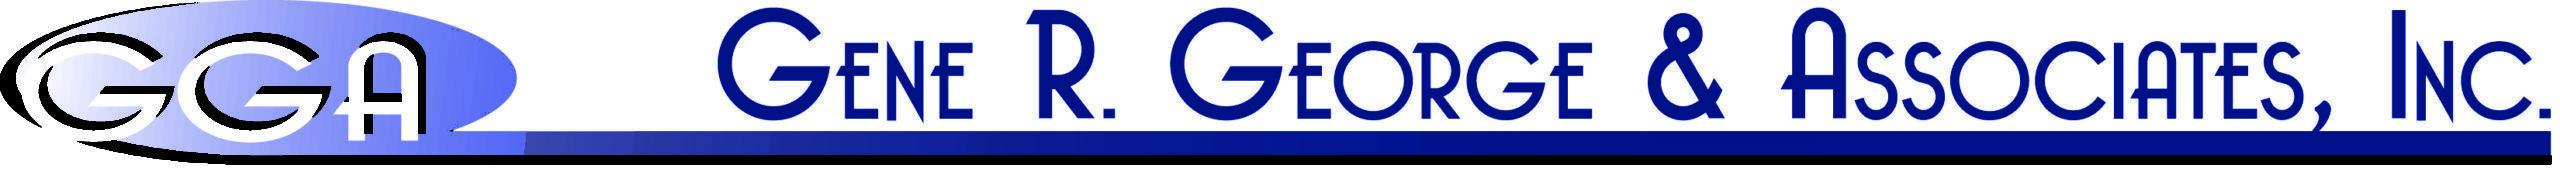 Gene R. George & Associates, Inc.